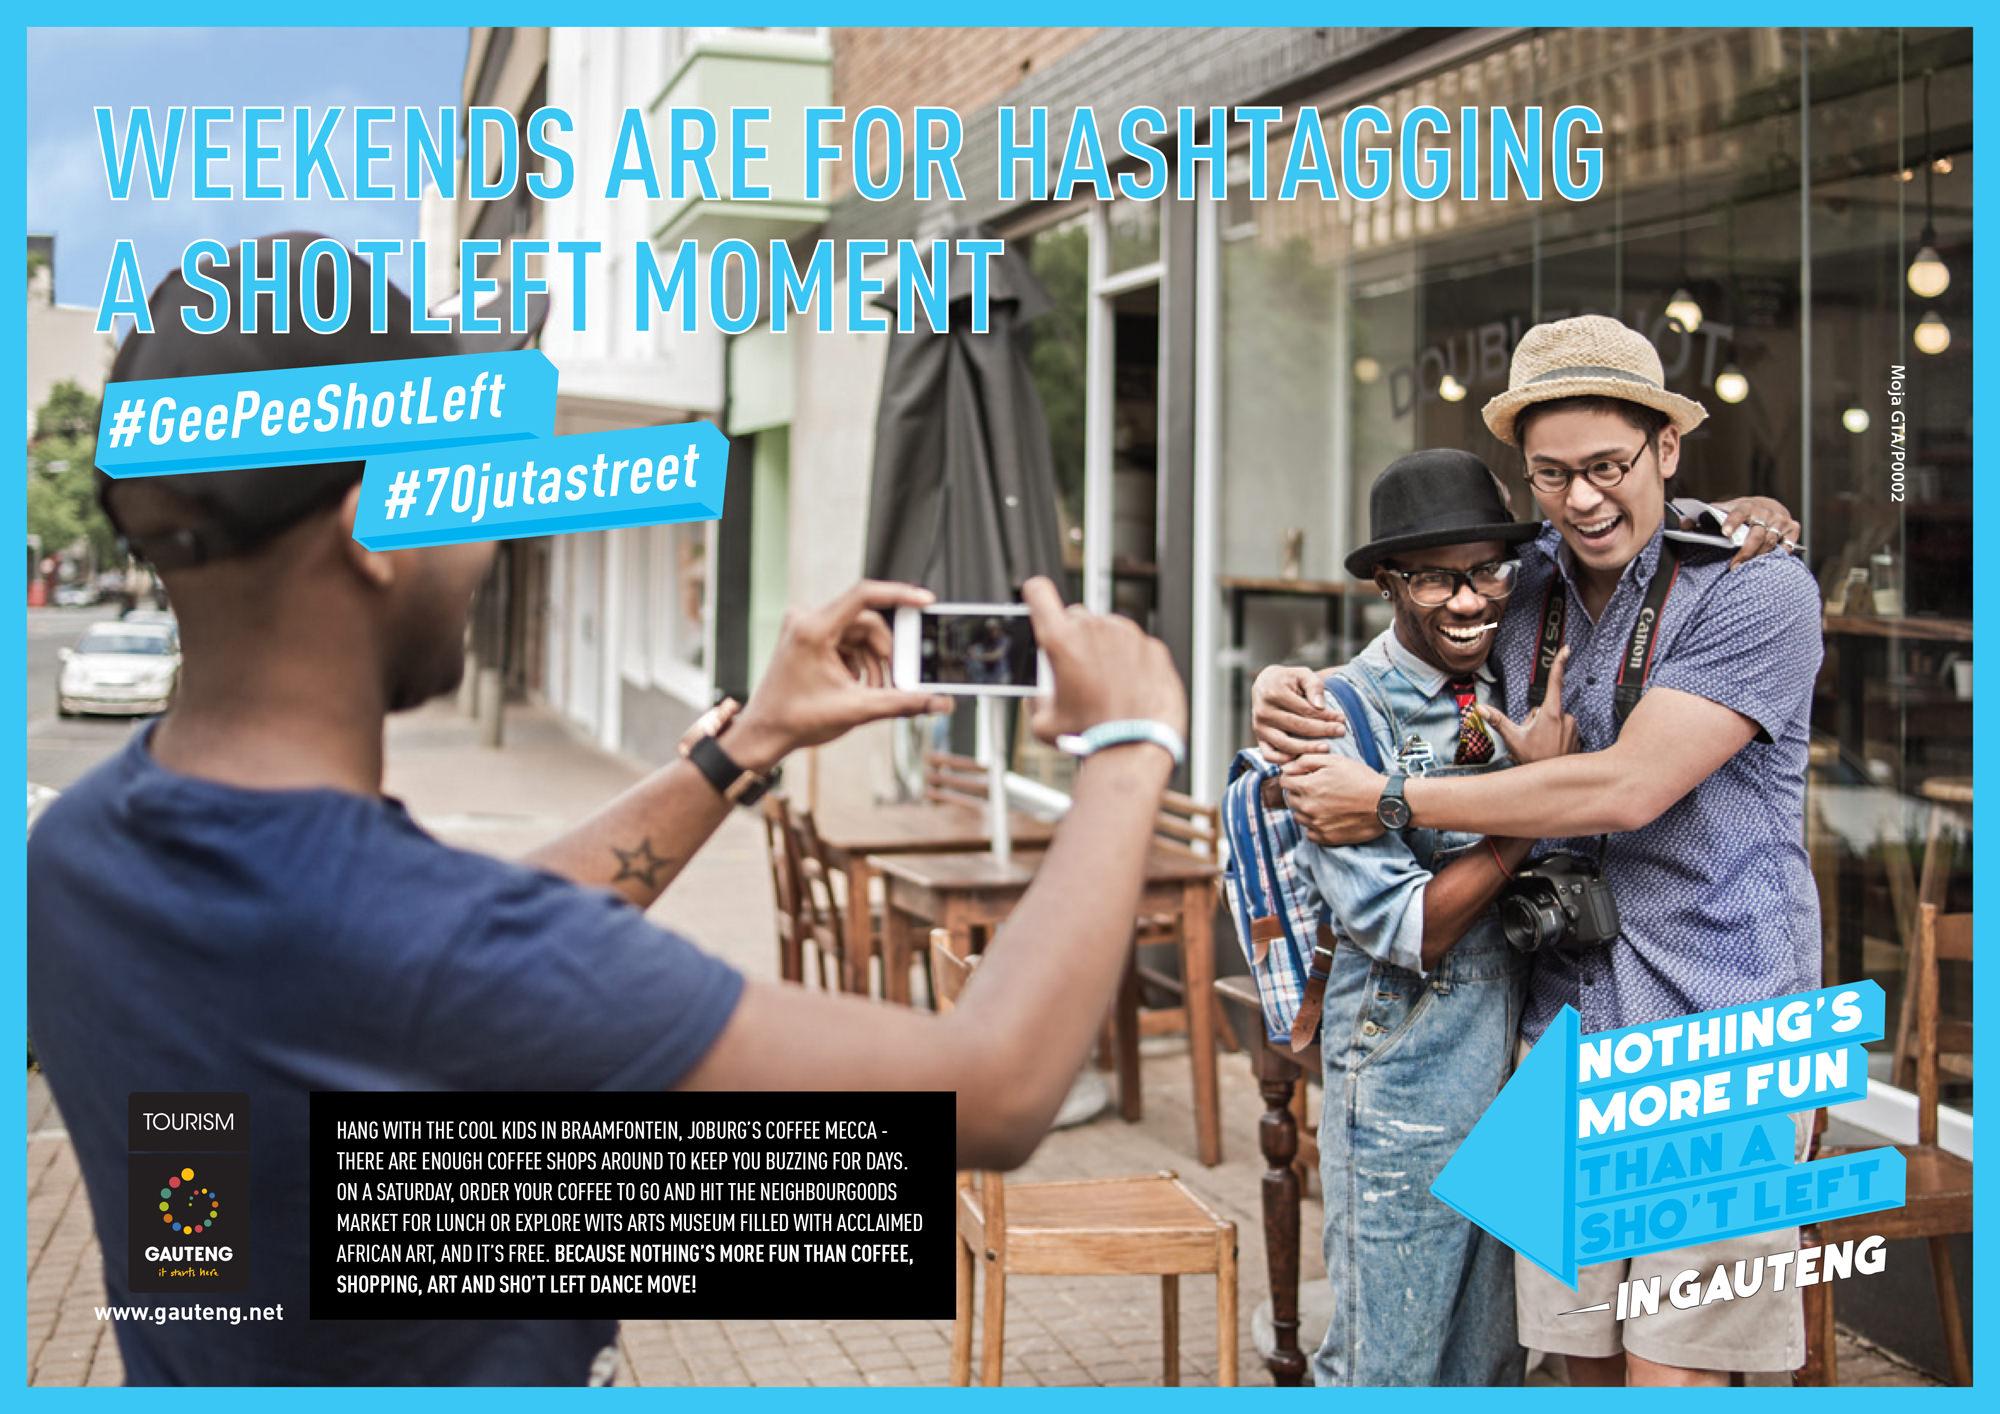 08Advertising 1. SA Tourism.jpg